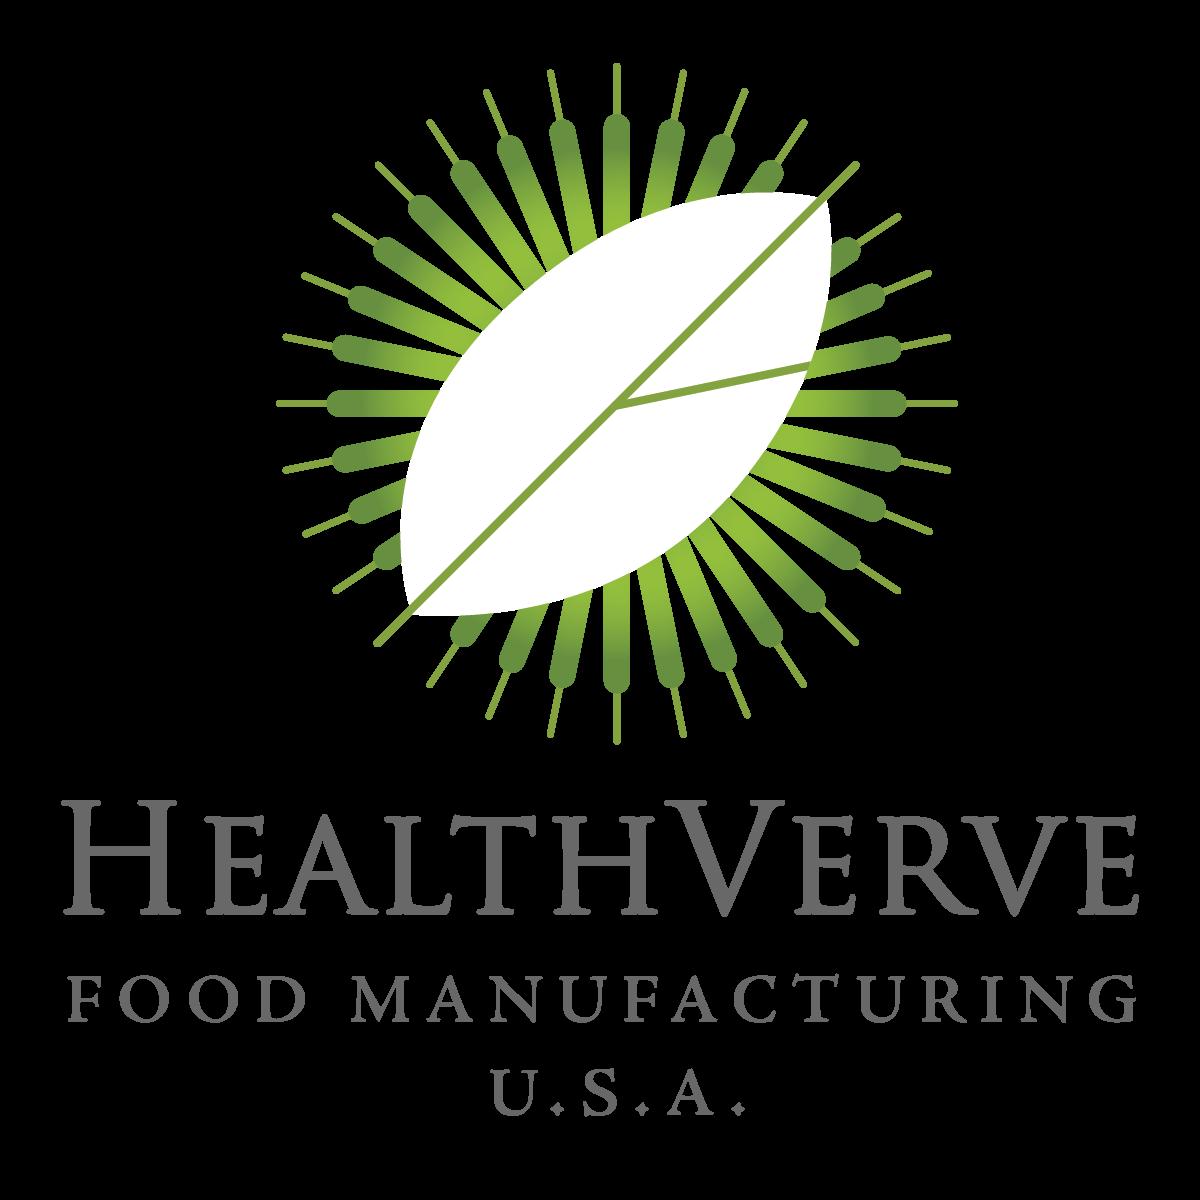 HealthVerve